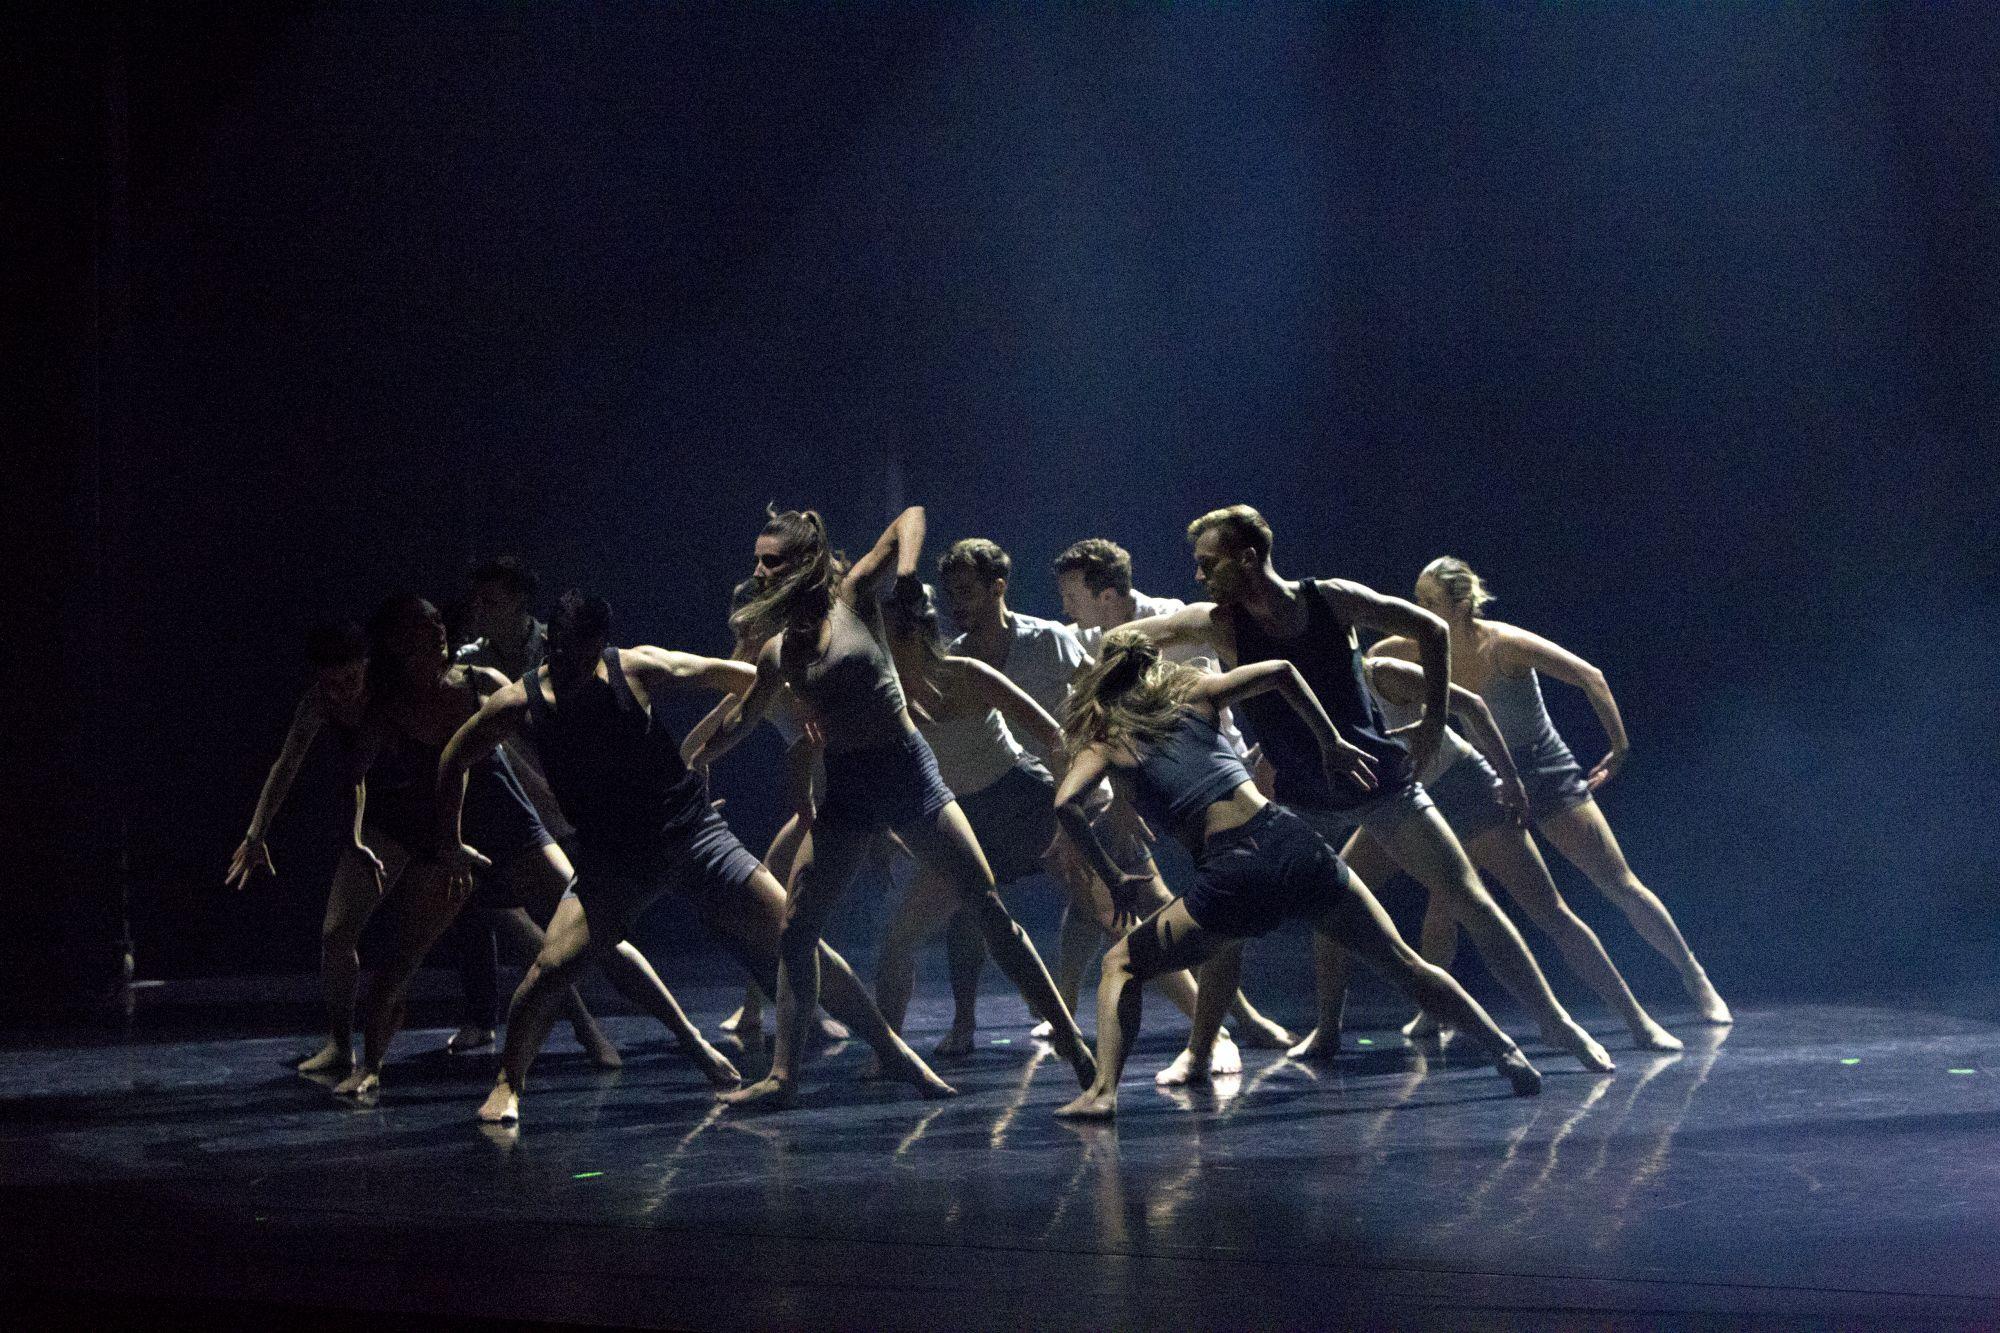 Sydney Dance Company, Lux Tenebris, Gaala 2019